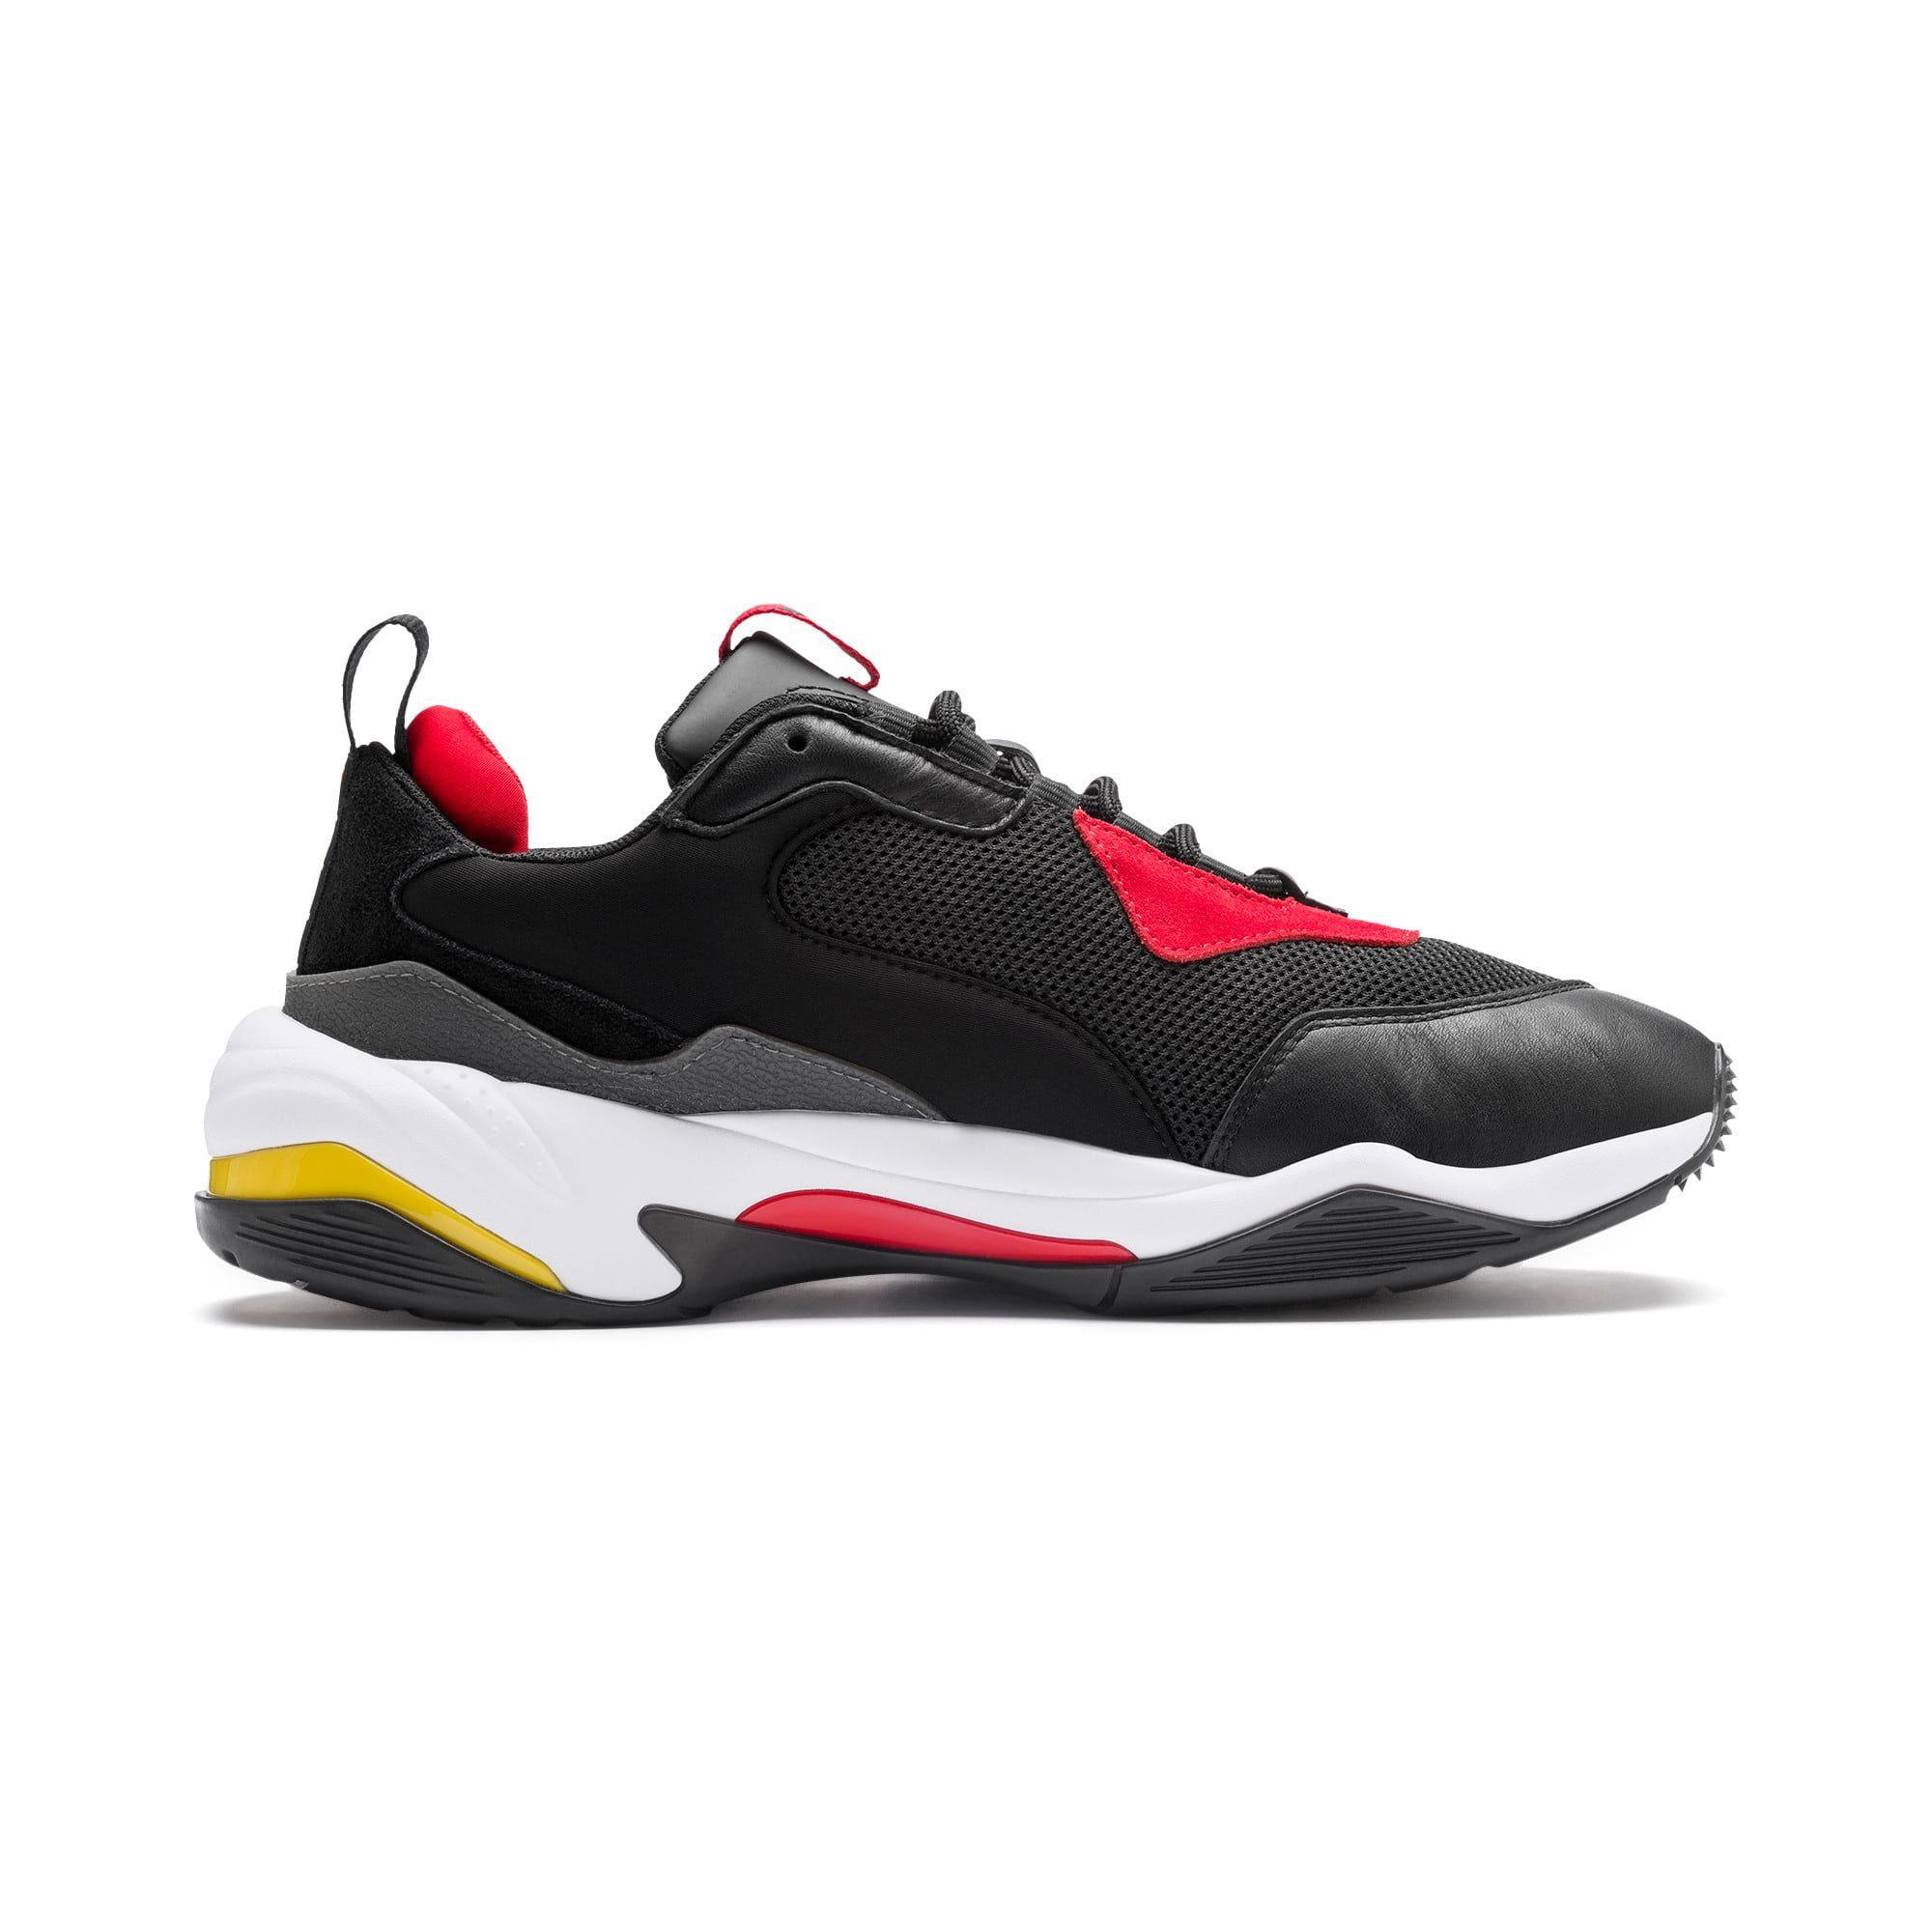 PUMA Ferrari Thunder Trainers, Red, size 7.5, Shoes